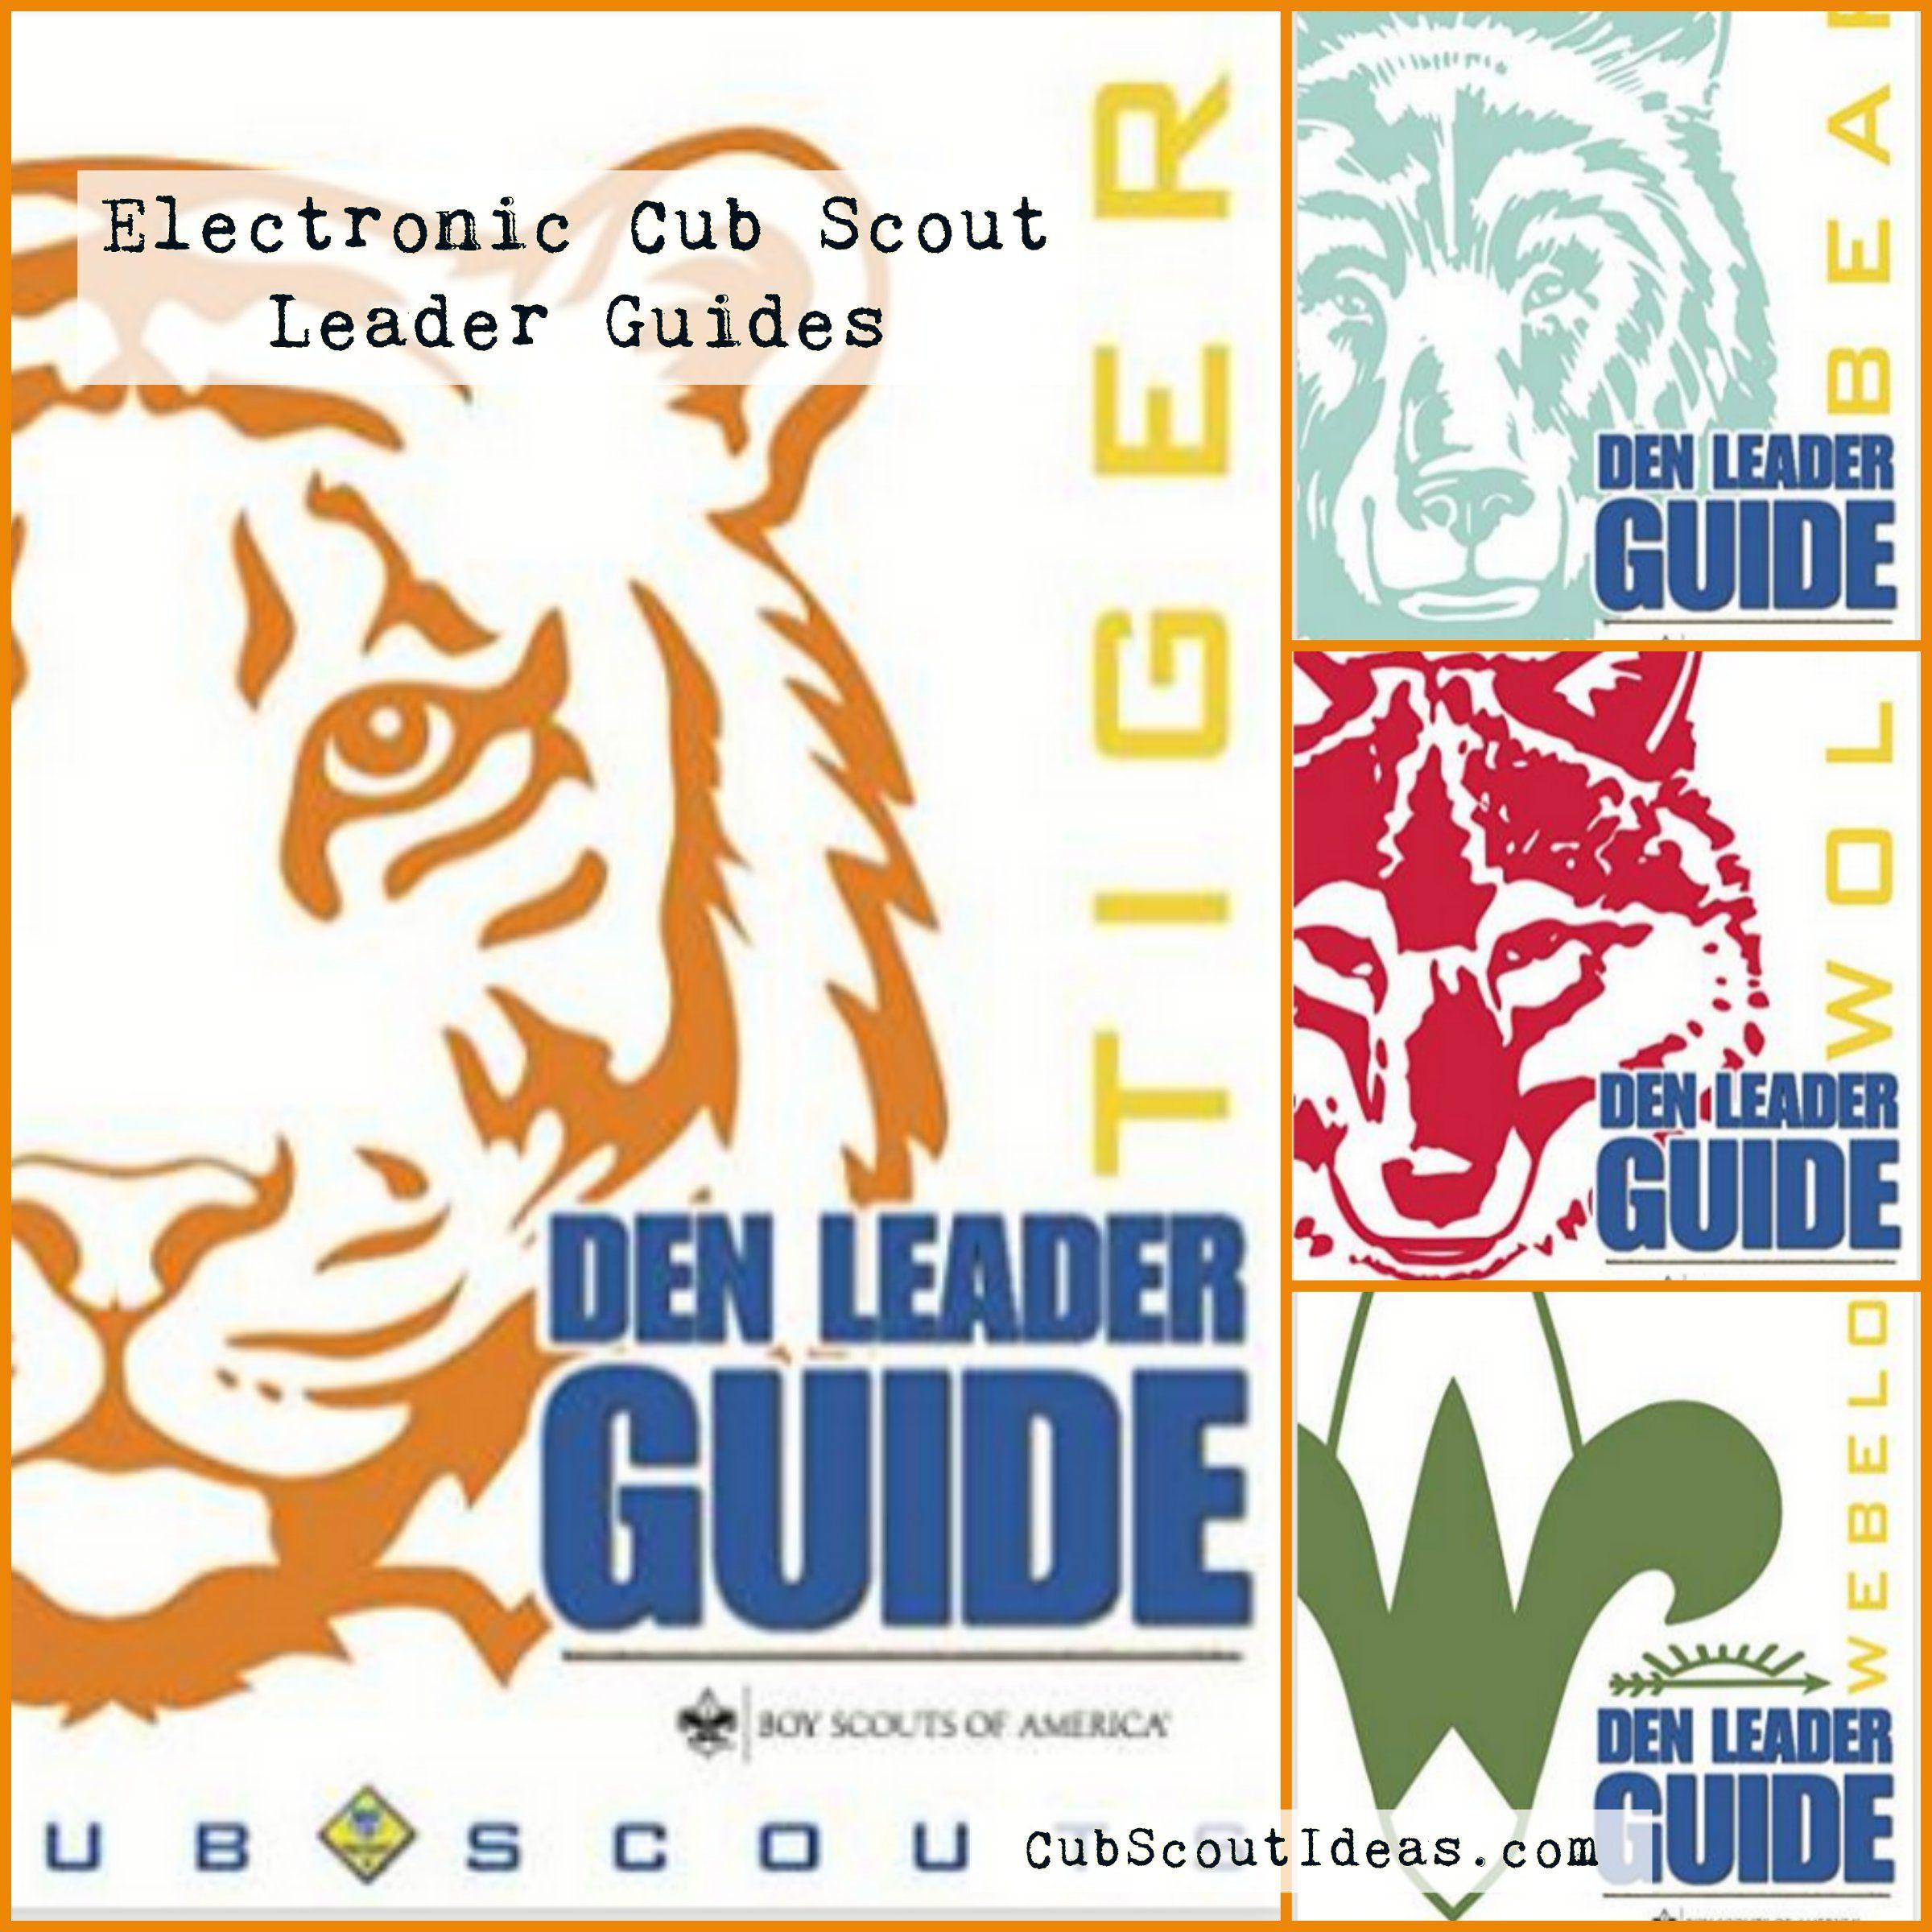 Electronic Cub Scout Den Leader Guides